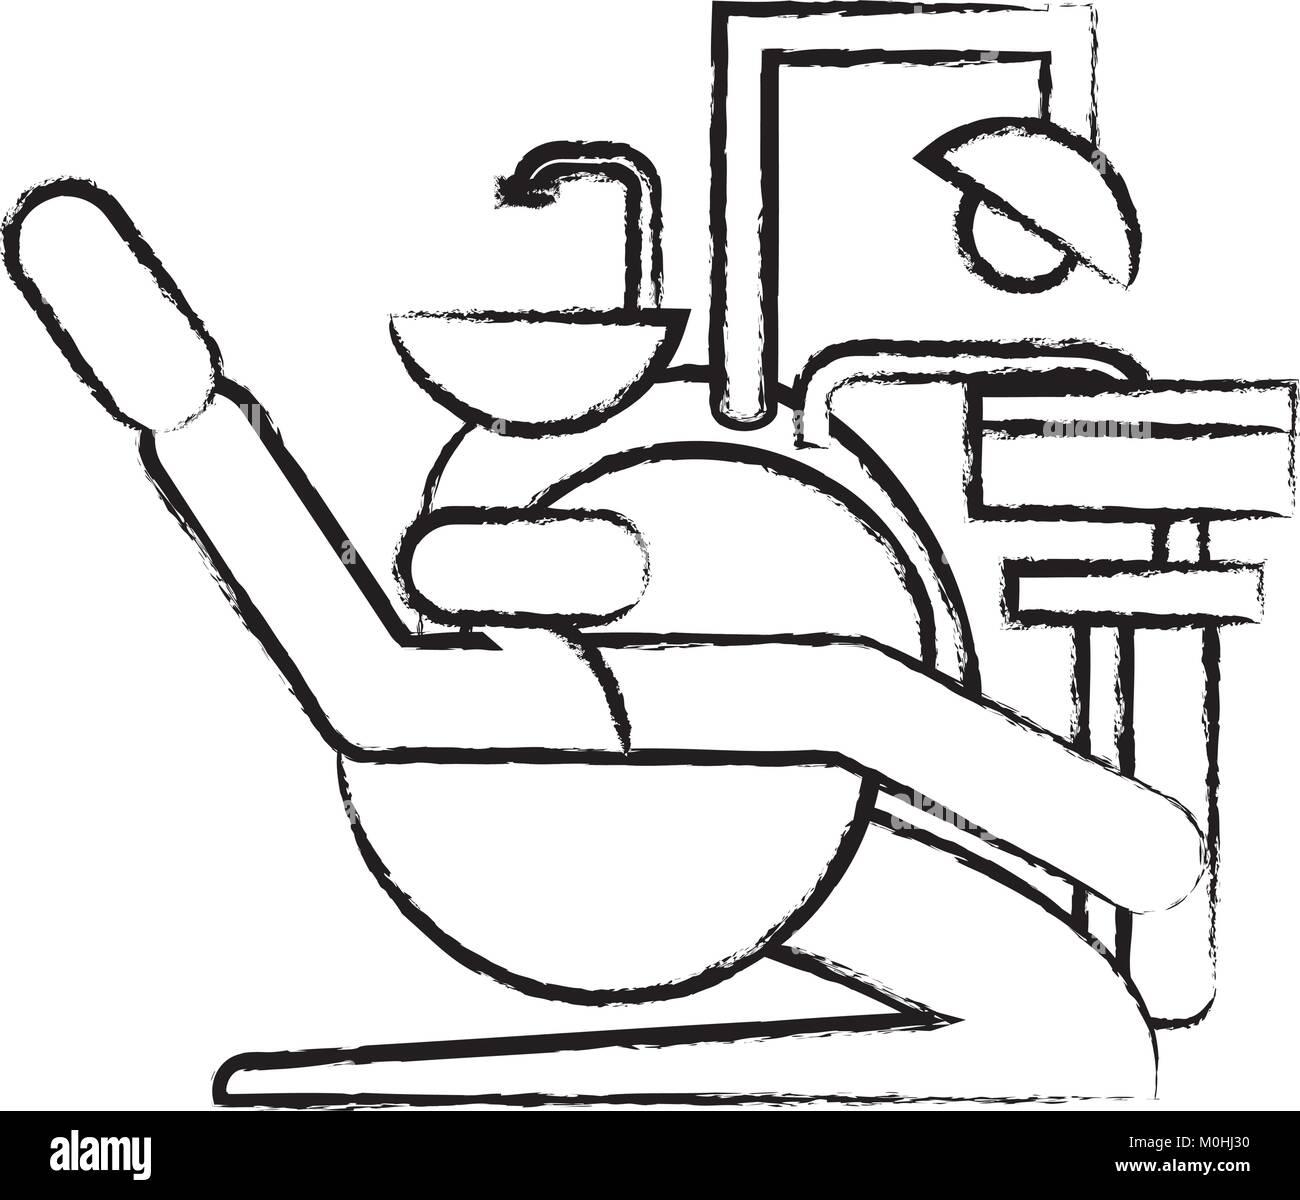 dental unit icon image - Stock Vector